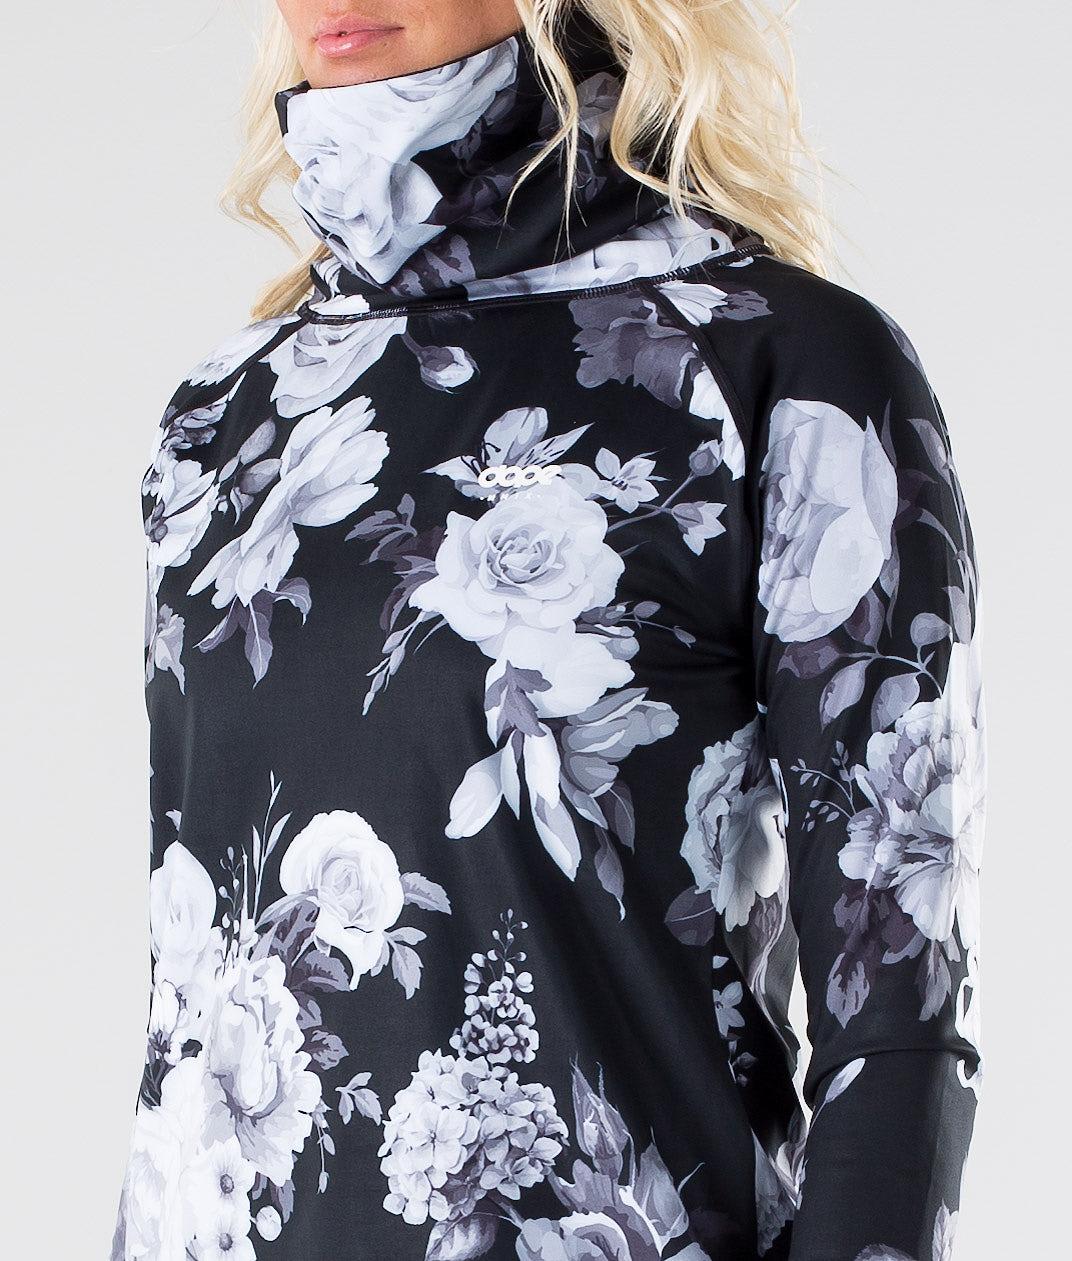 Dope Snuggle OG W Superundertøy overdel Black Flower